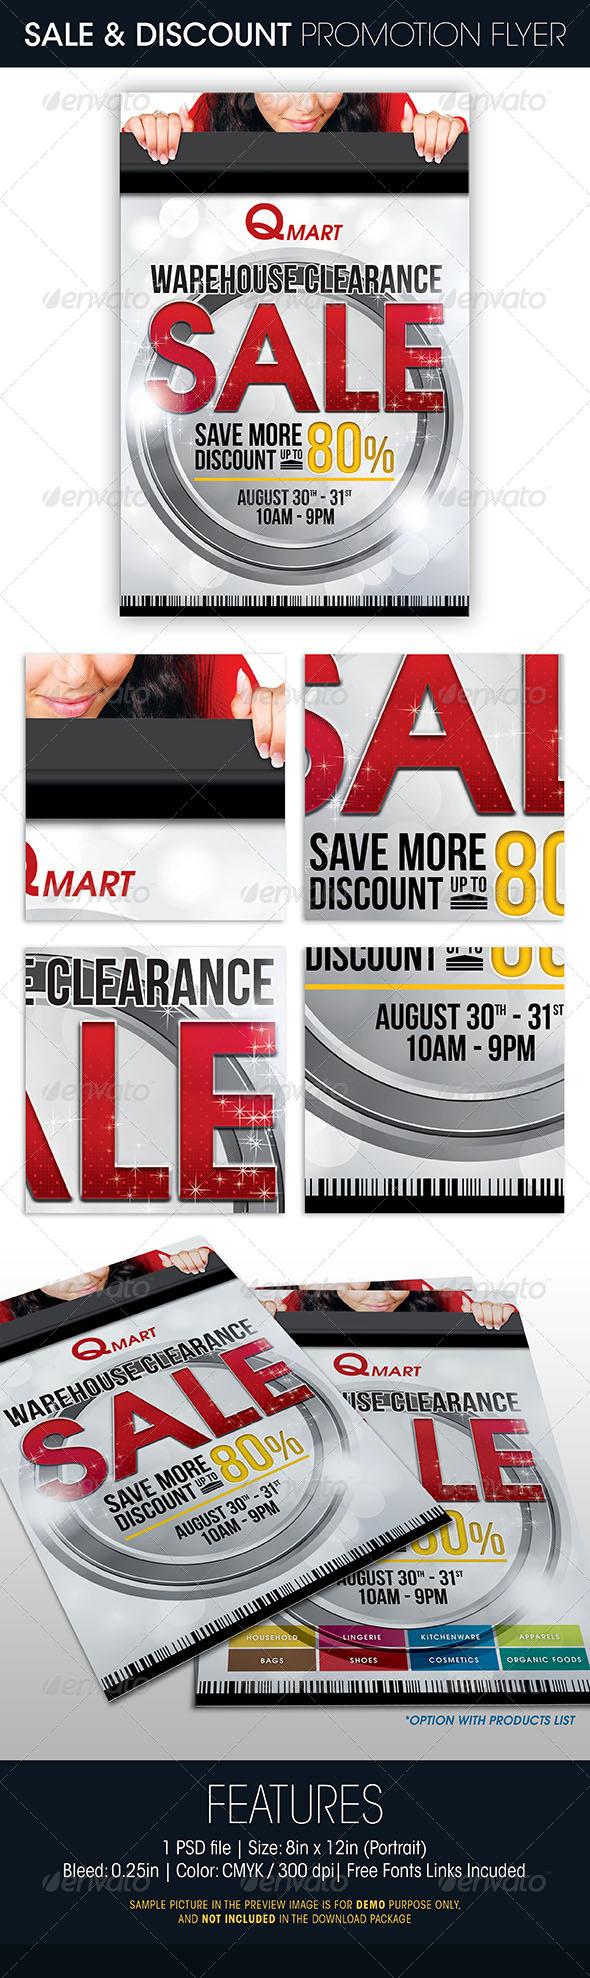 GraphicRiver Sale Discount Promotion Flyer 5383097